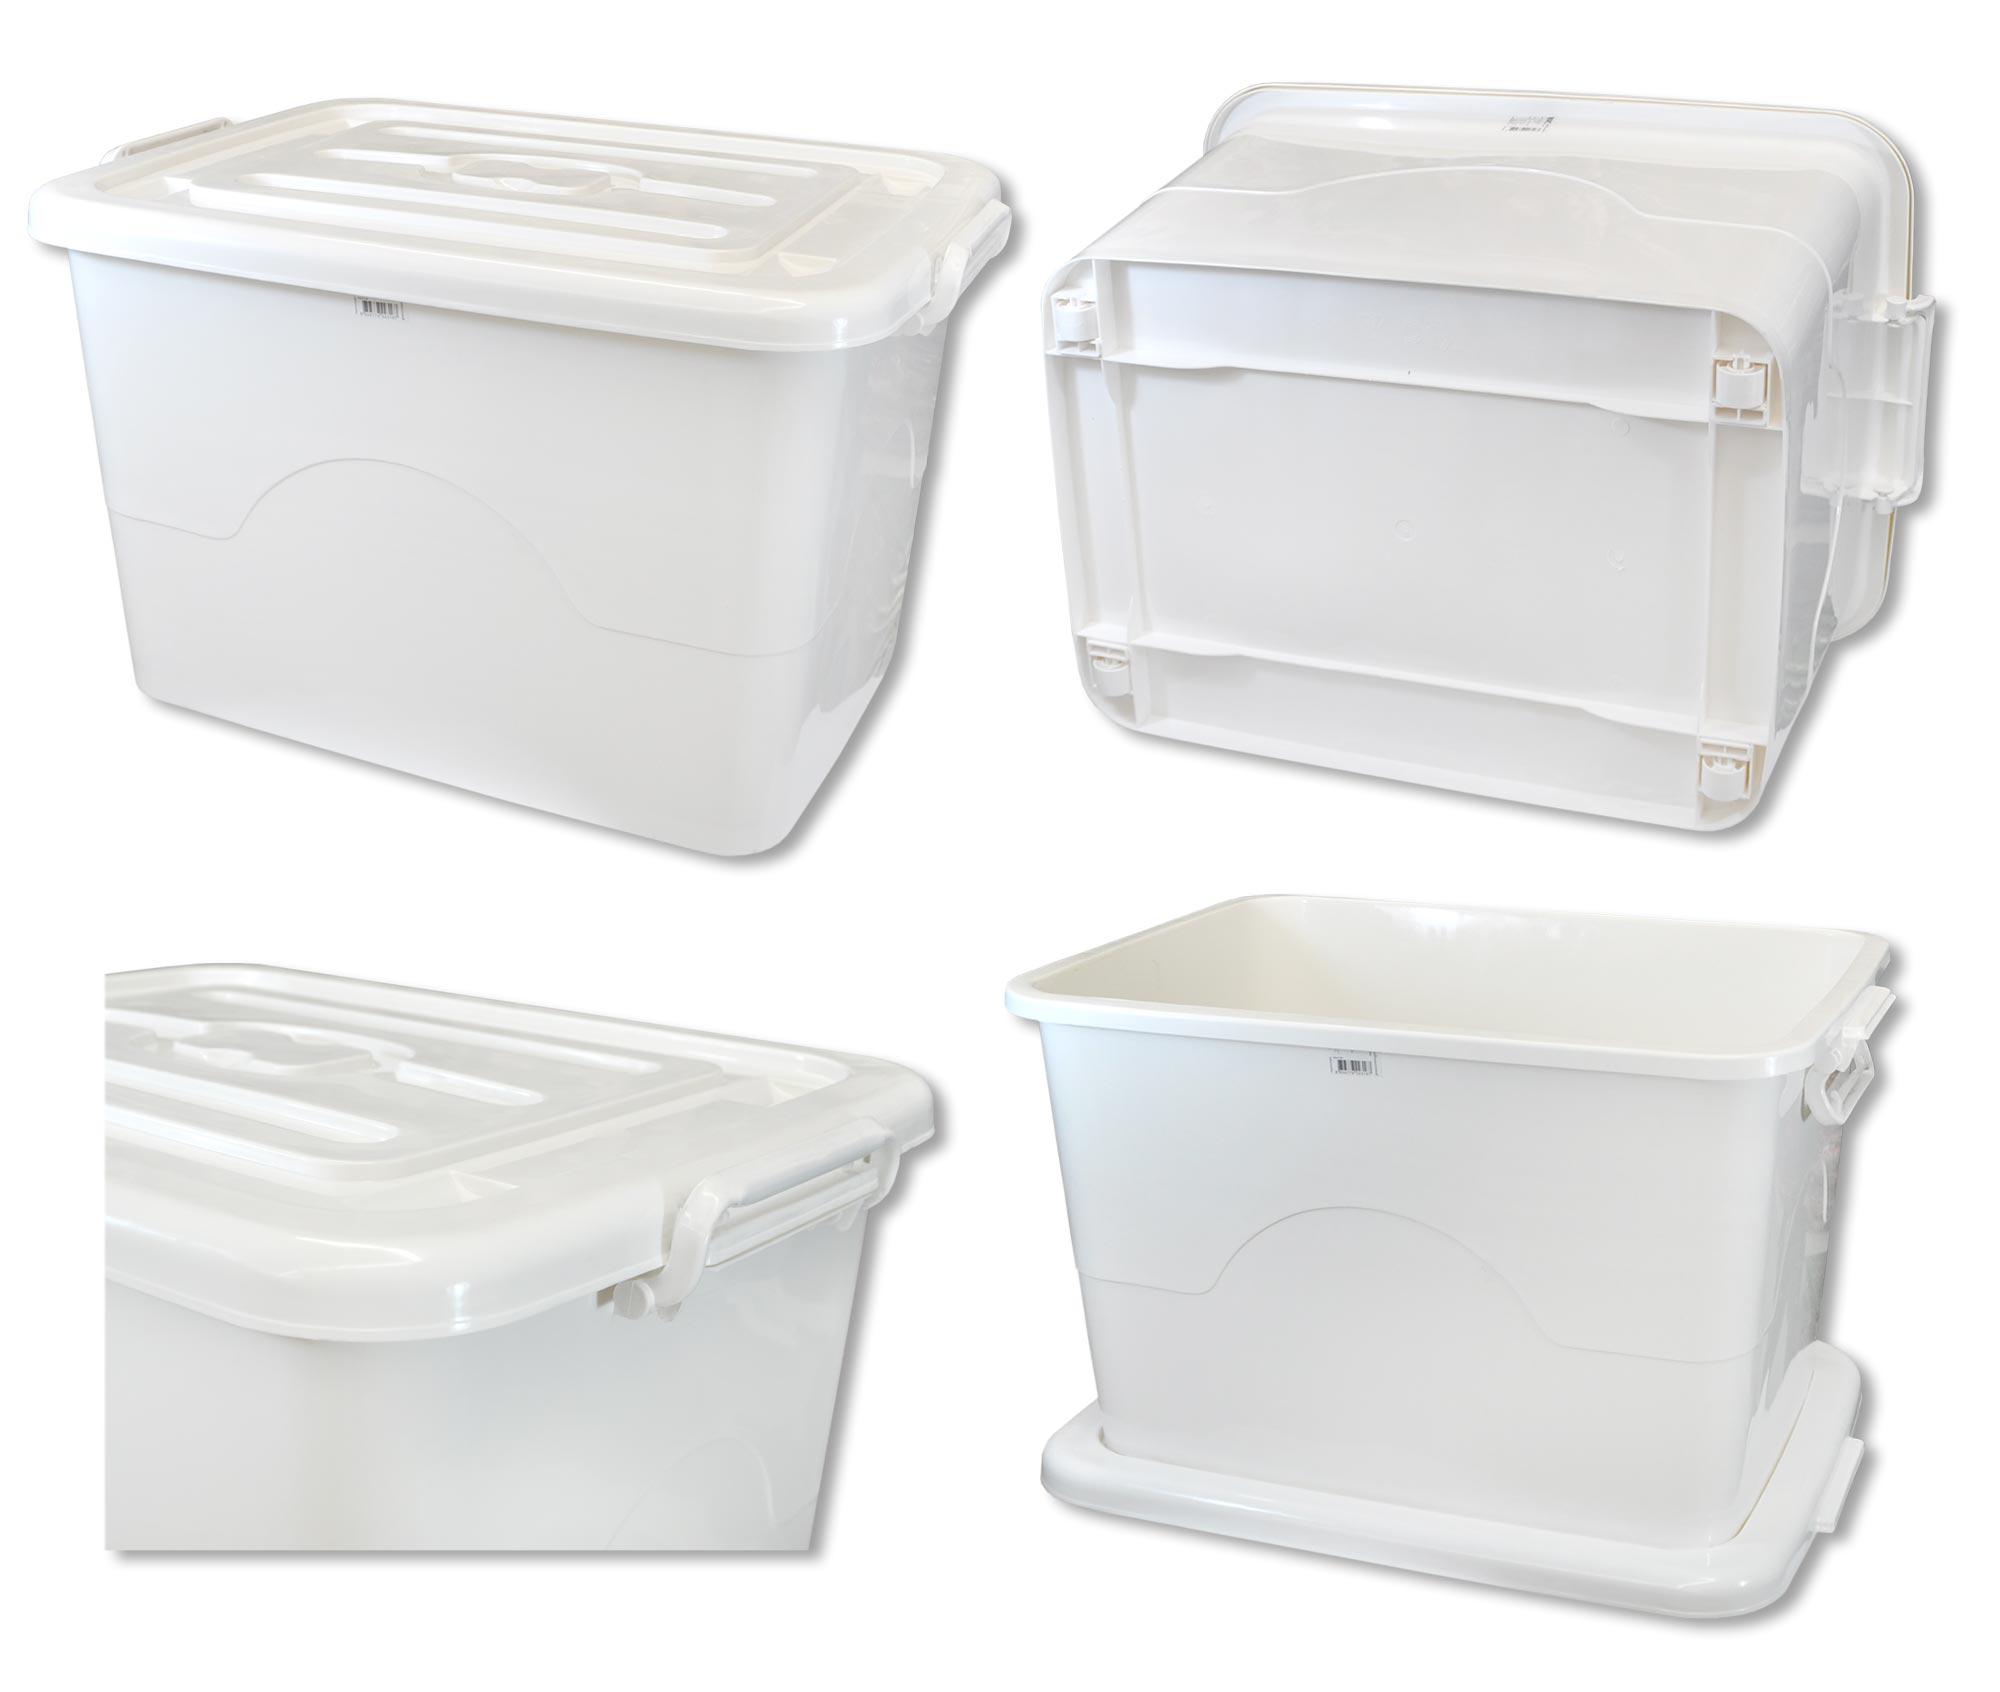 4 x plastikkiste box stapelbar 95 l wei allzweckbox rollcontainer ebay. Black Bedroom Furniture Sets. Home Design Ideas